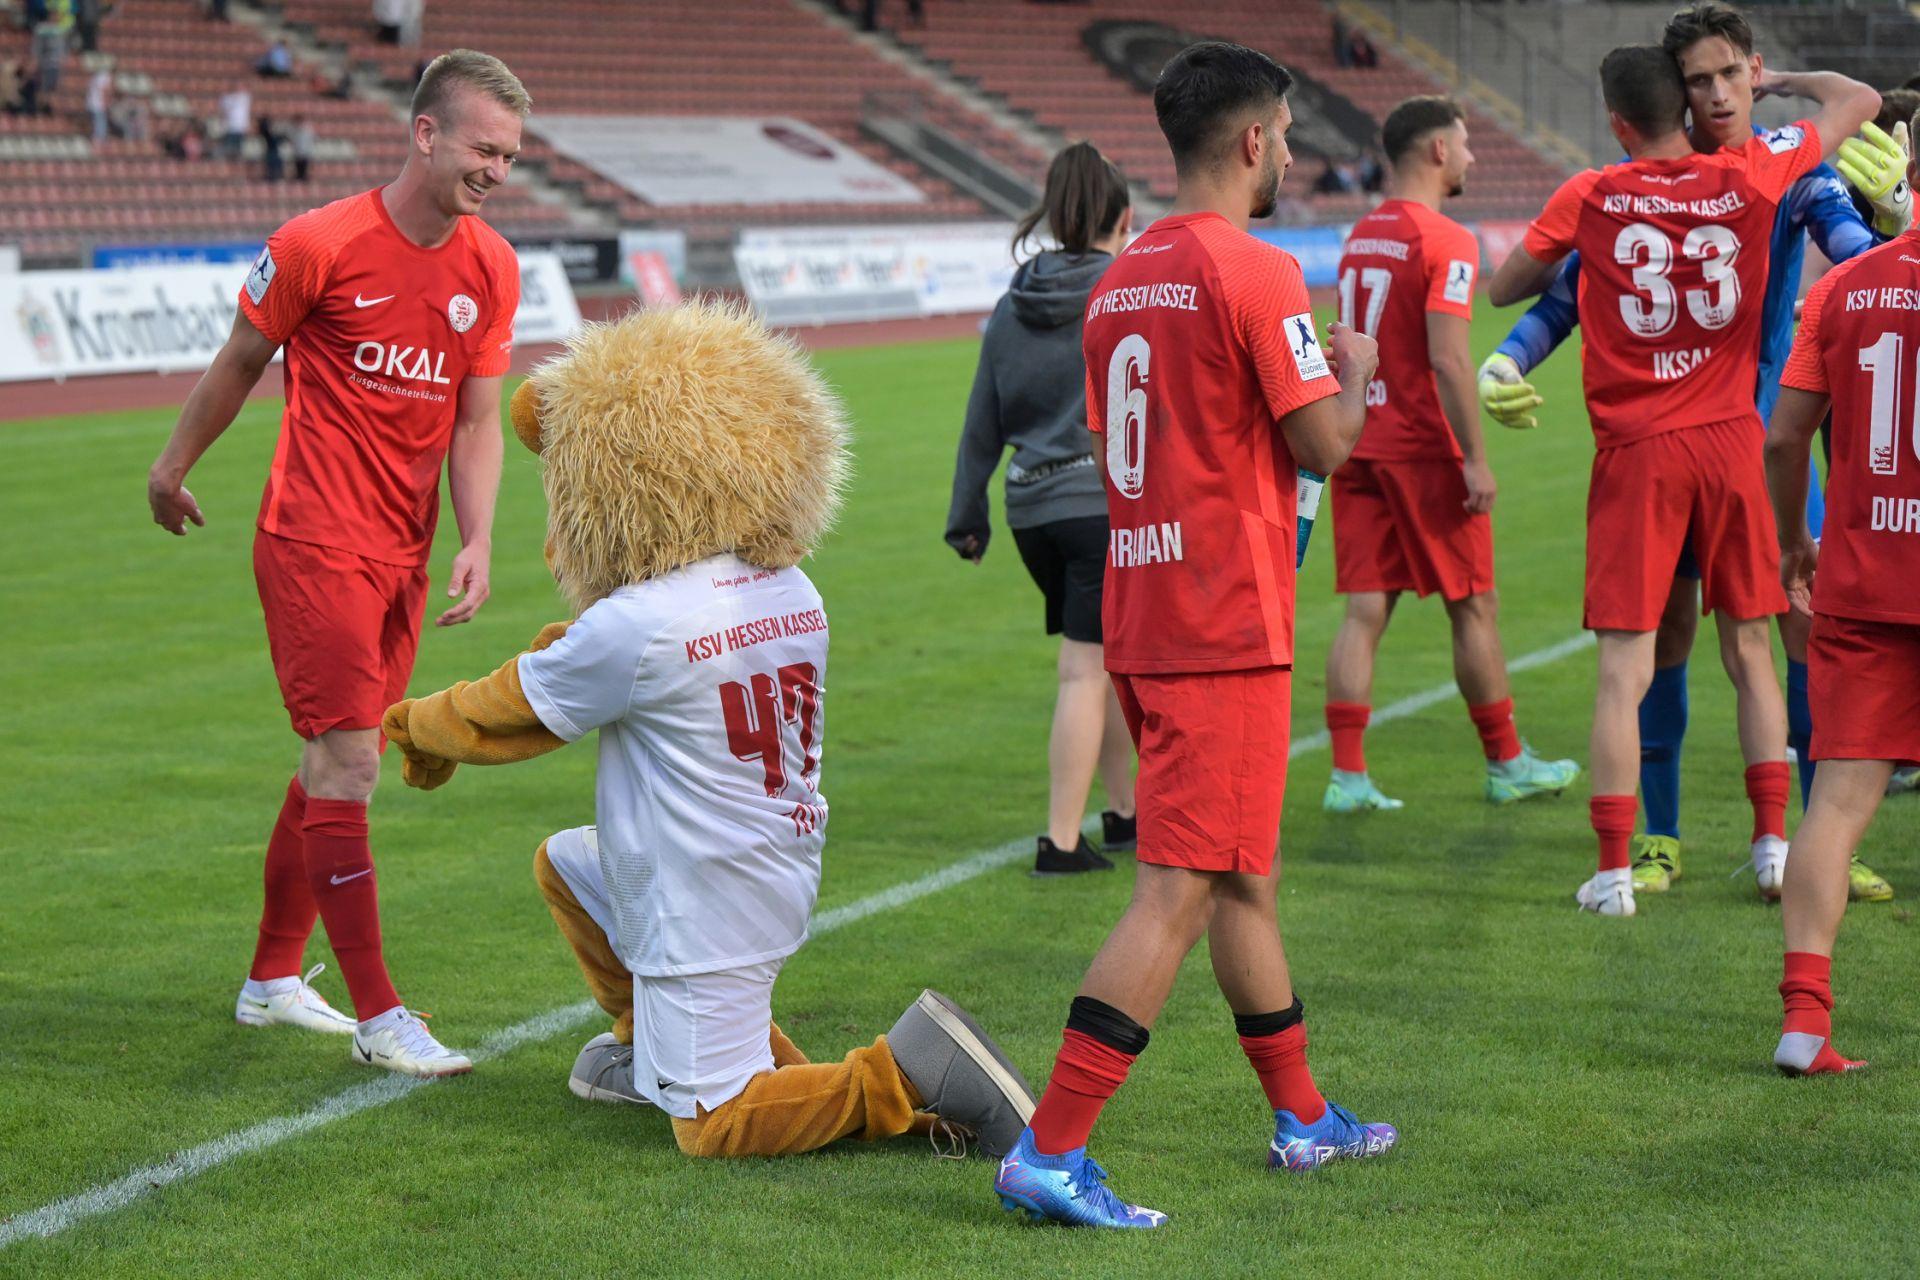 KSV Hessen Kassel, VfB Stuttgart II, Regionalliga S�dwest, Saison 2021/22, Endstand 3:2, Jubel zum 3:2